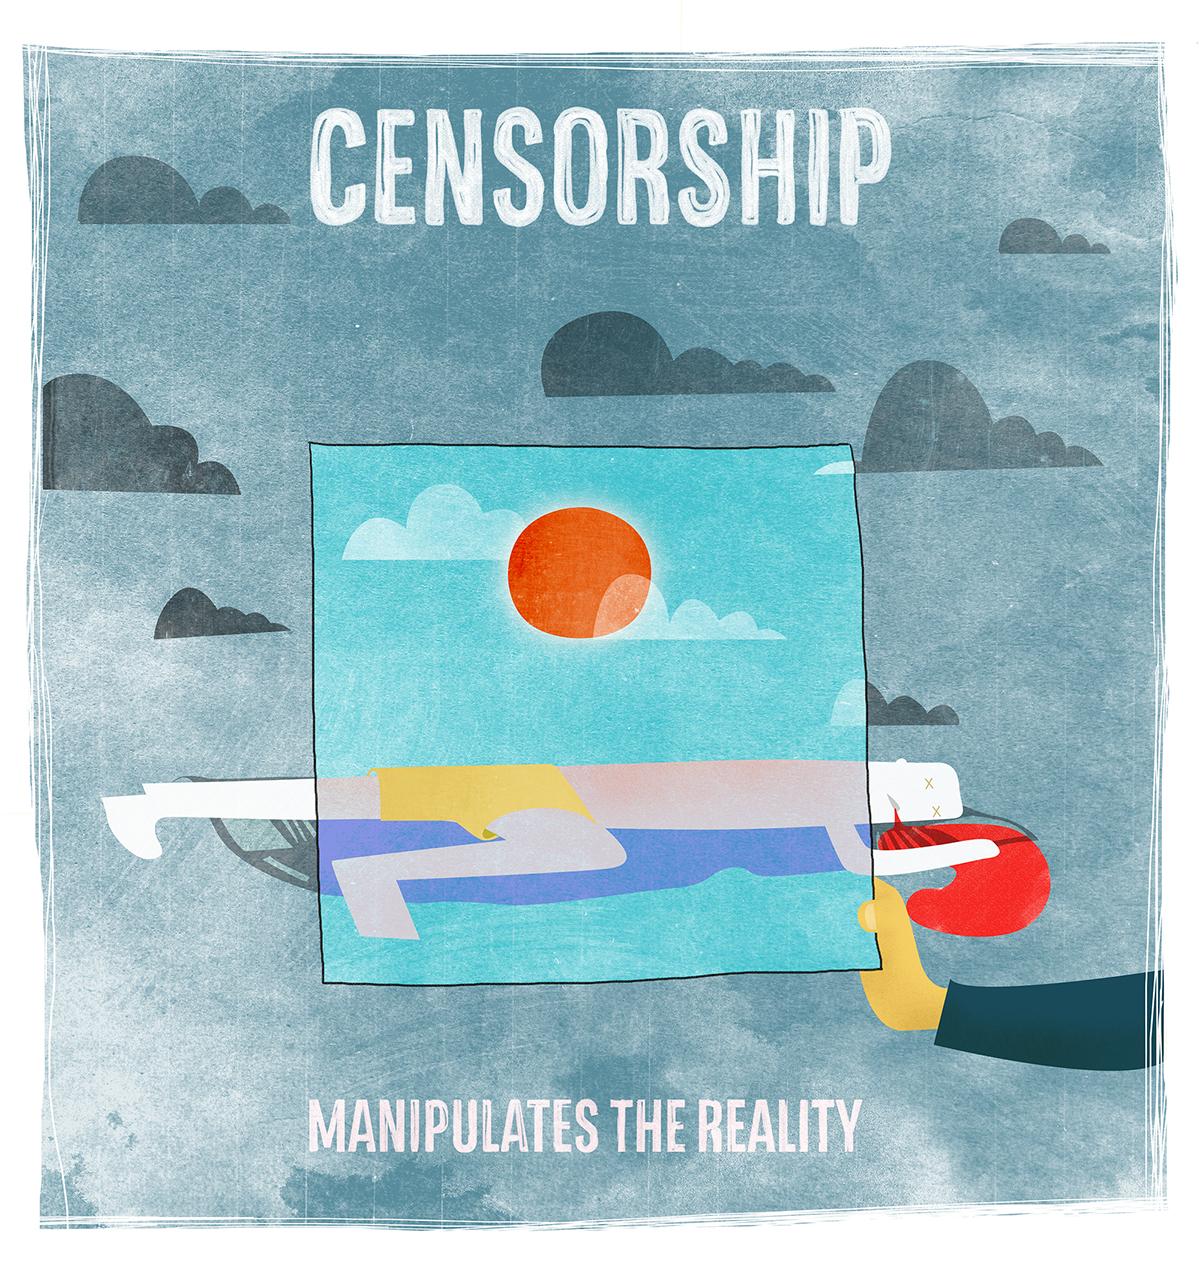 Censorship censorship in turkey freedom of speech freedom freedom of expression Occupy Turkey Censored